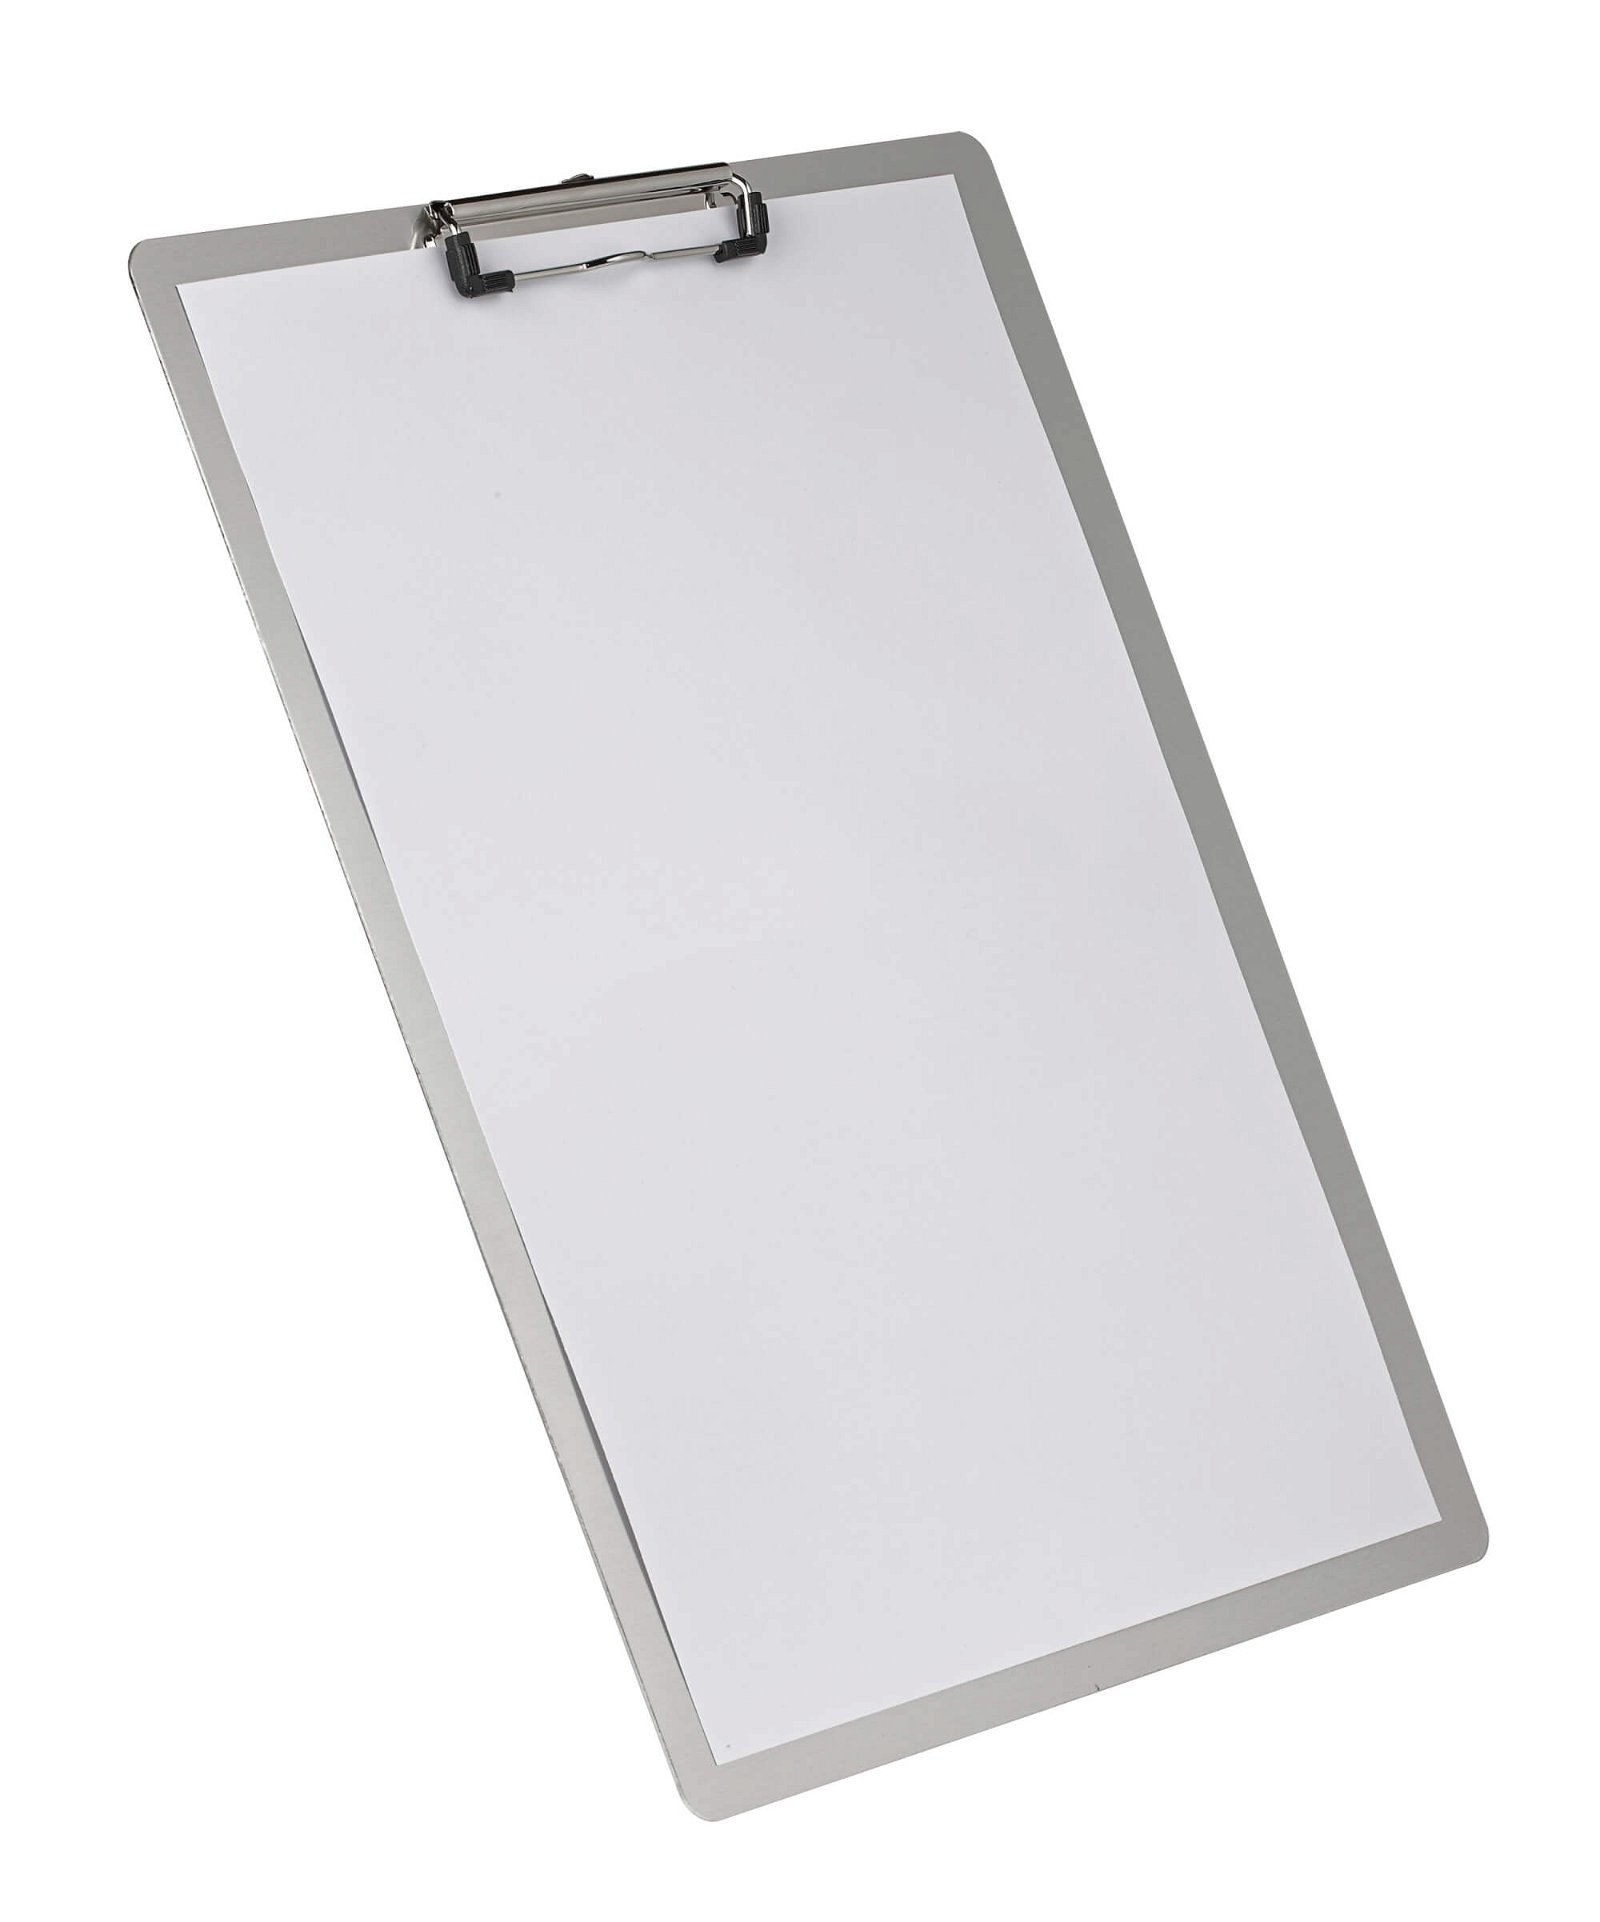 A3 Schreibplatte Aluminium mit Bügelklemme, aluminium